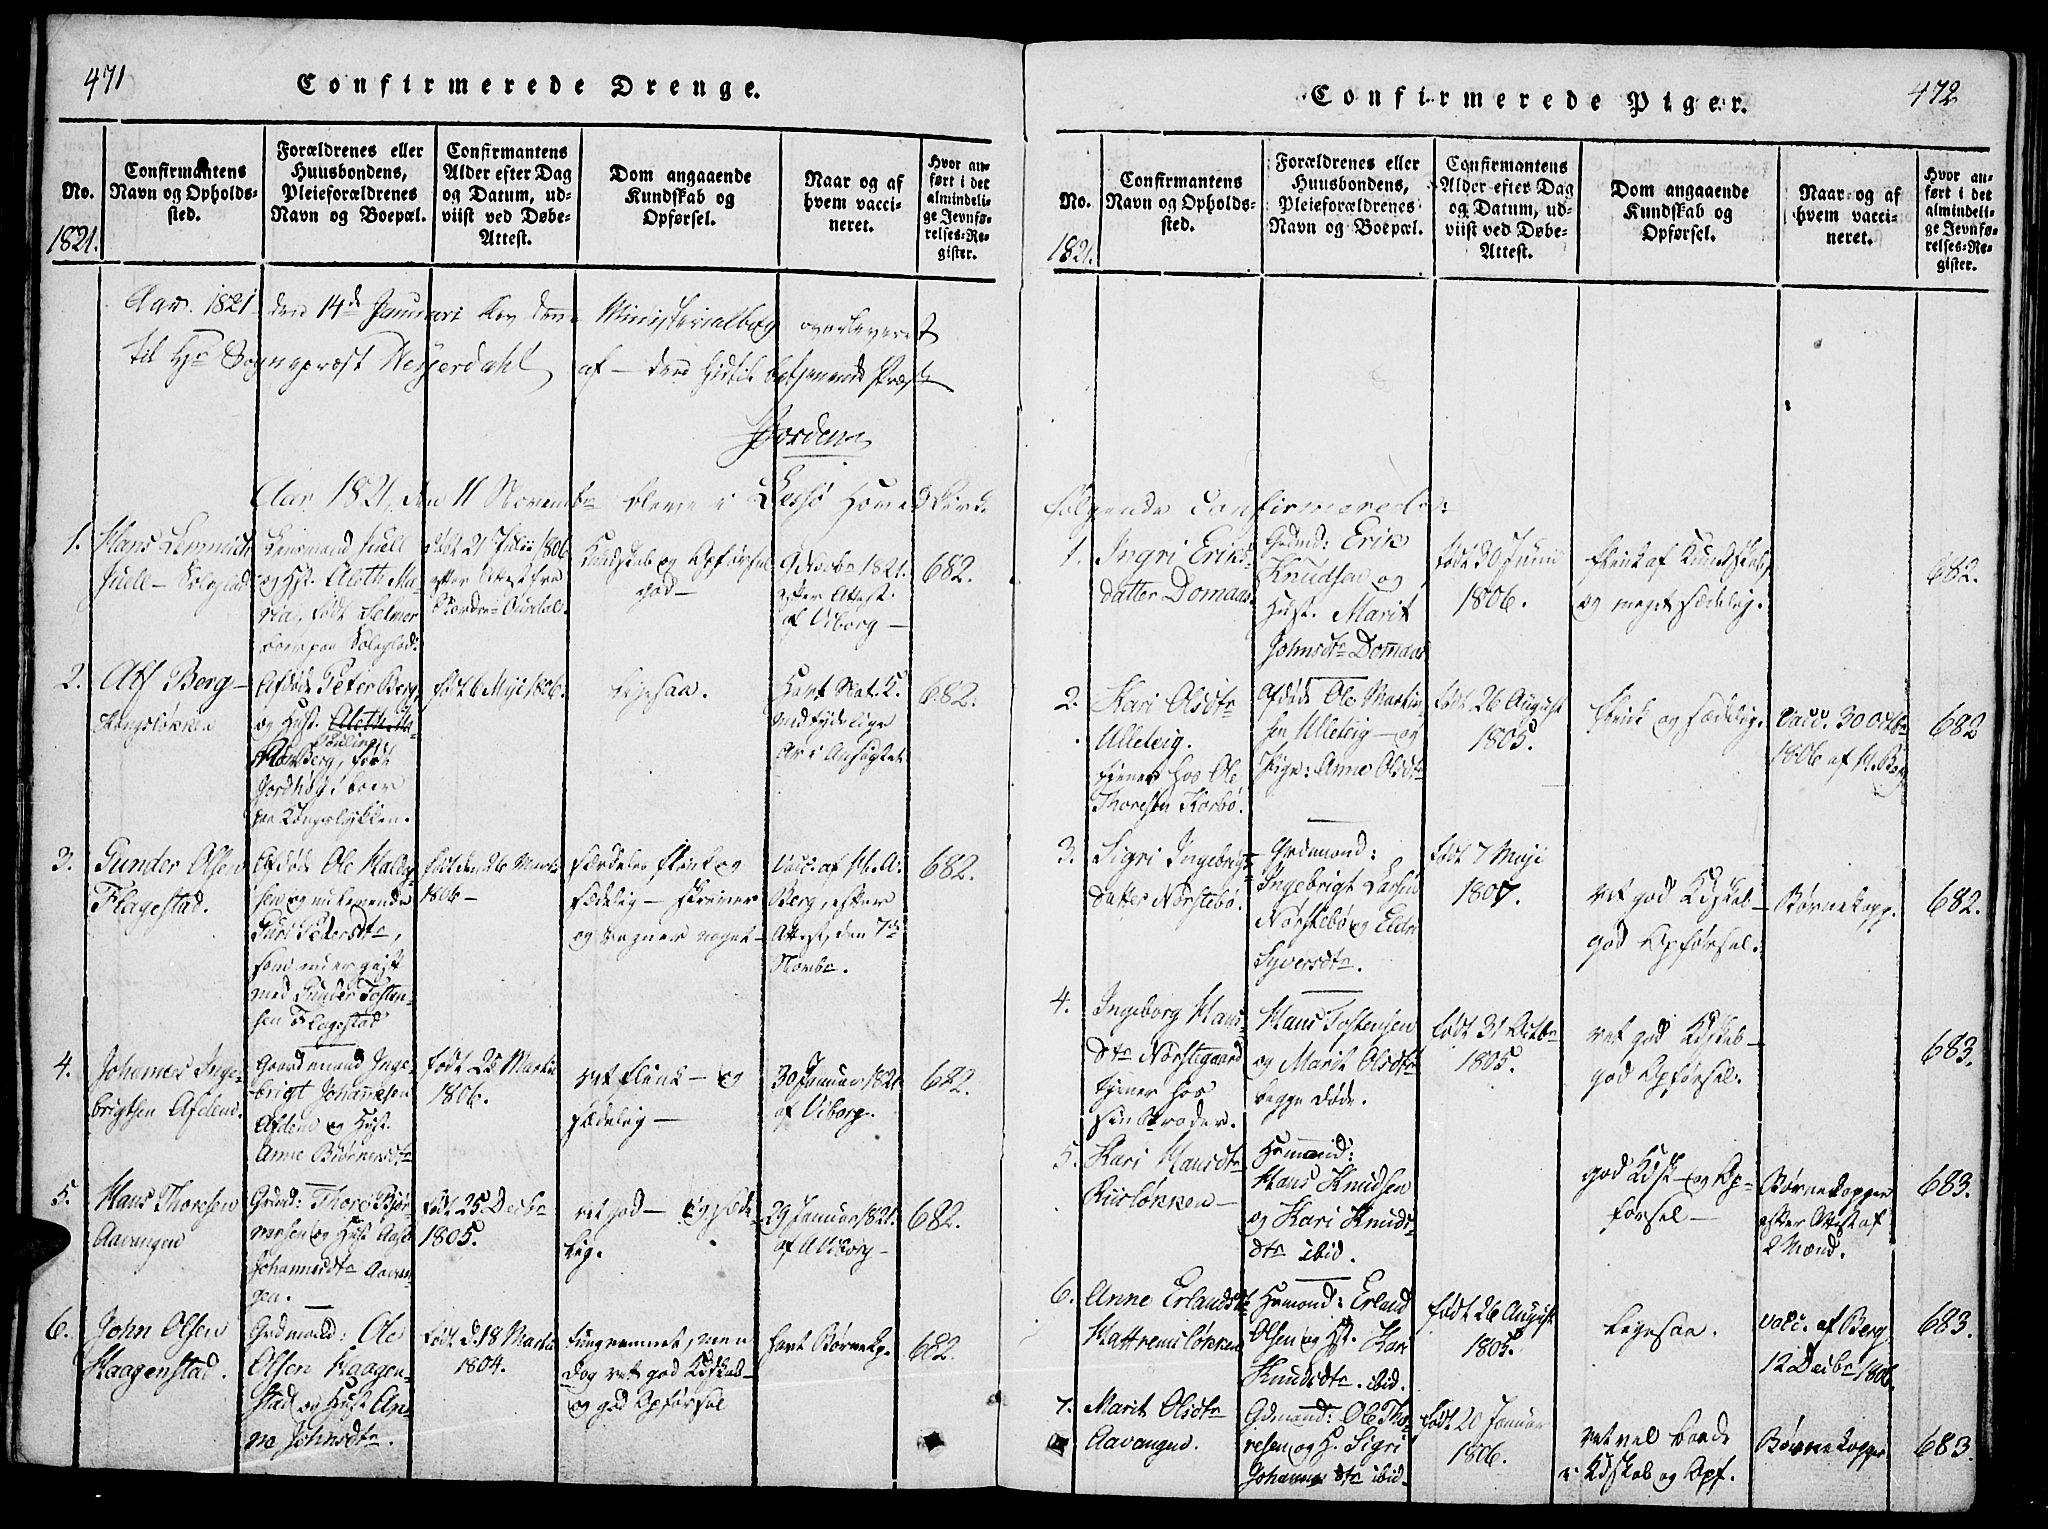 SAH, Lesja prestekontor, Ministerialbok nr. 4, 1820-1829, s. 471-472